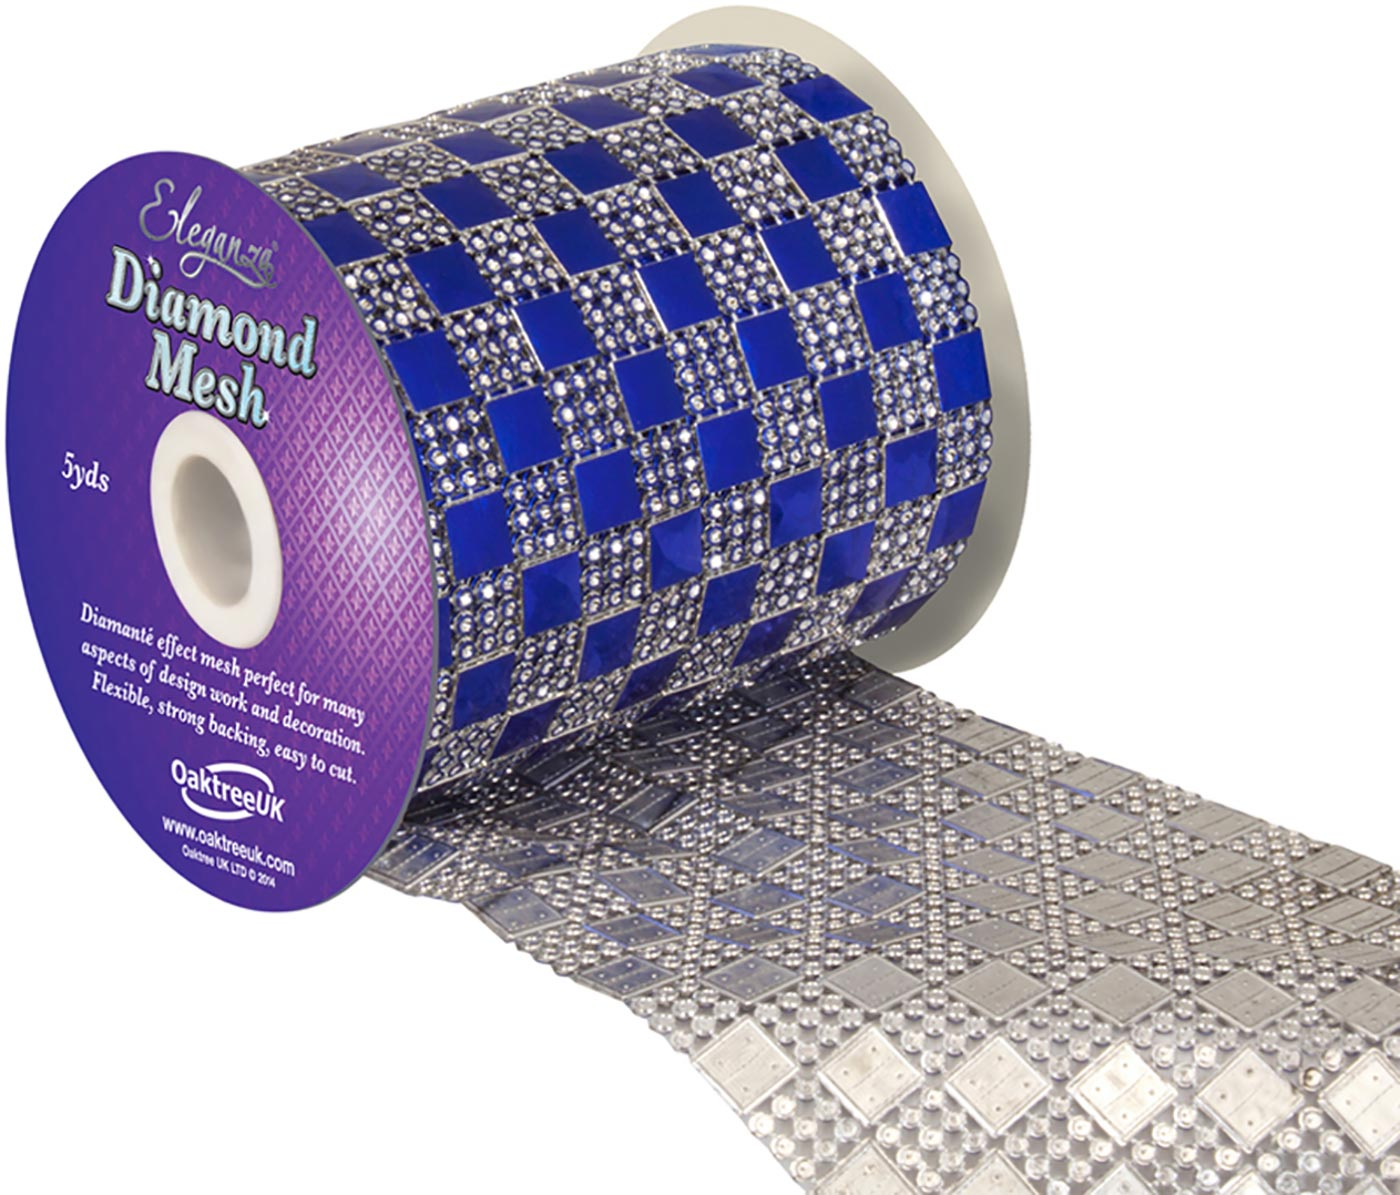 Eleganza Diamond Mesh 11cm x 4.5m Pattern No.350 Sapphire Blue